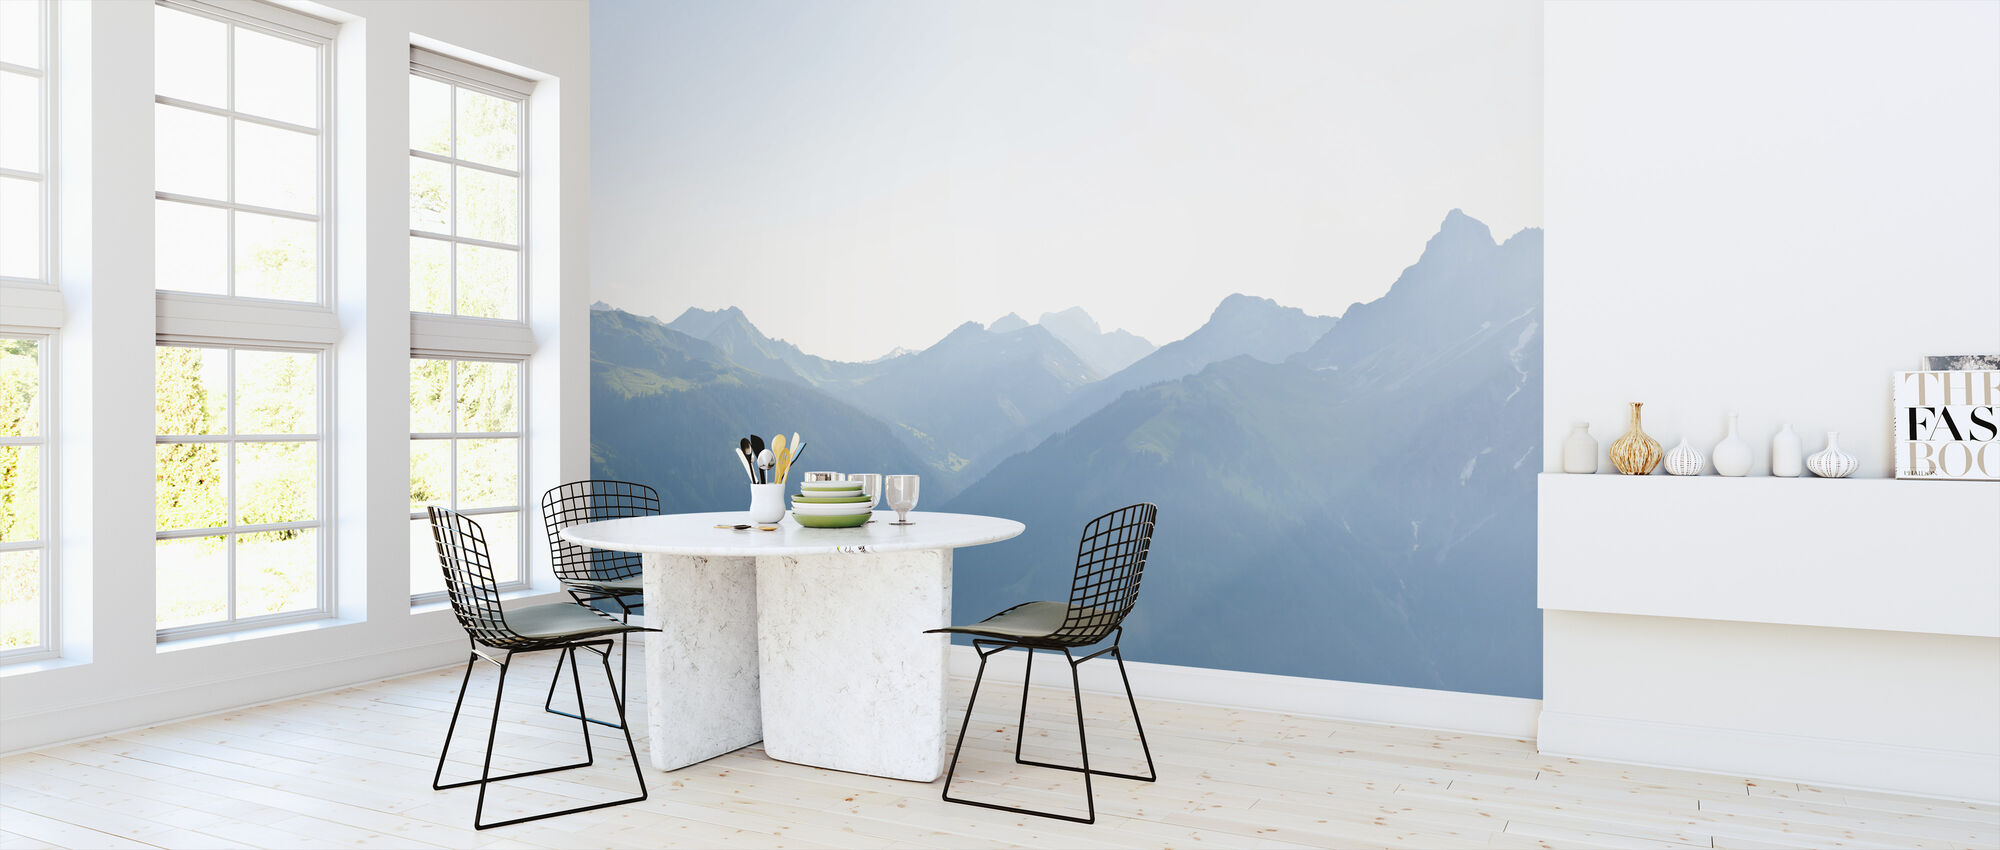 Vorarlberg, Austria - Tapet - Kök